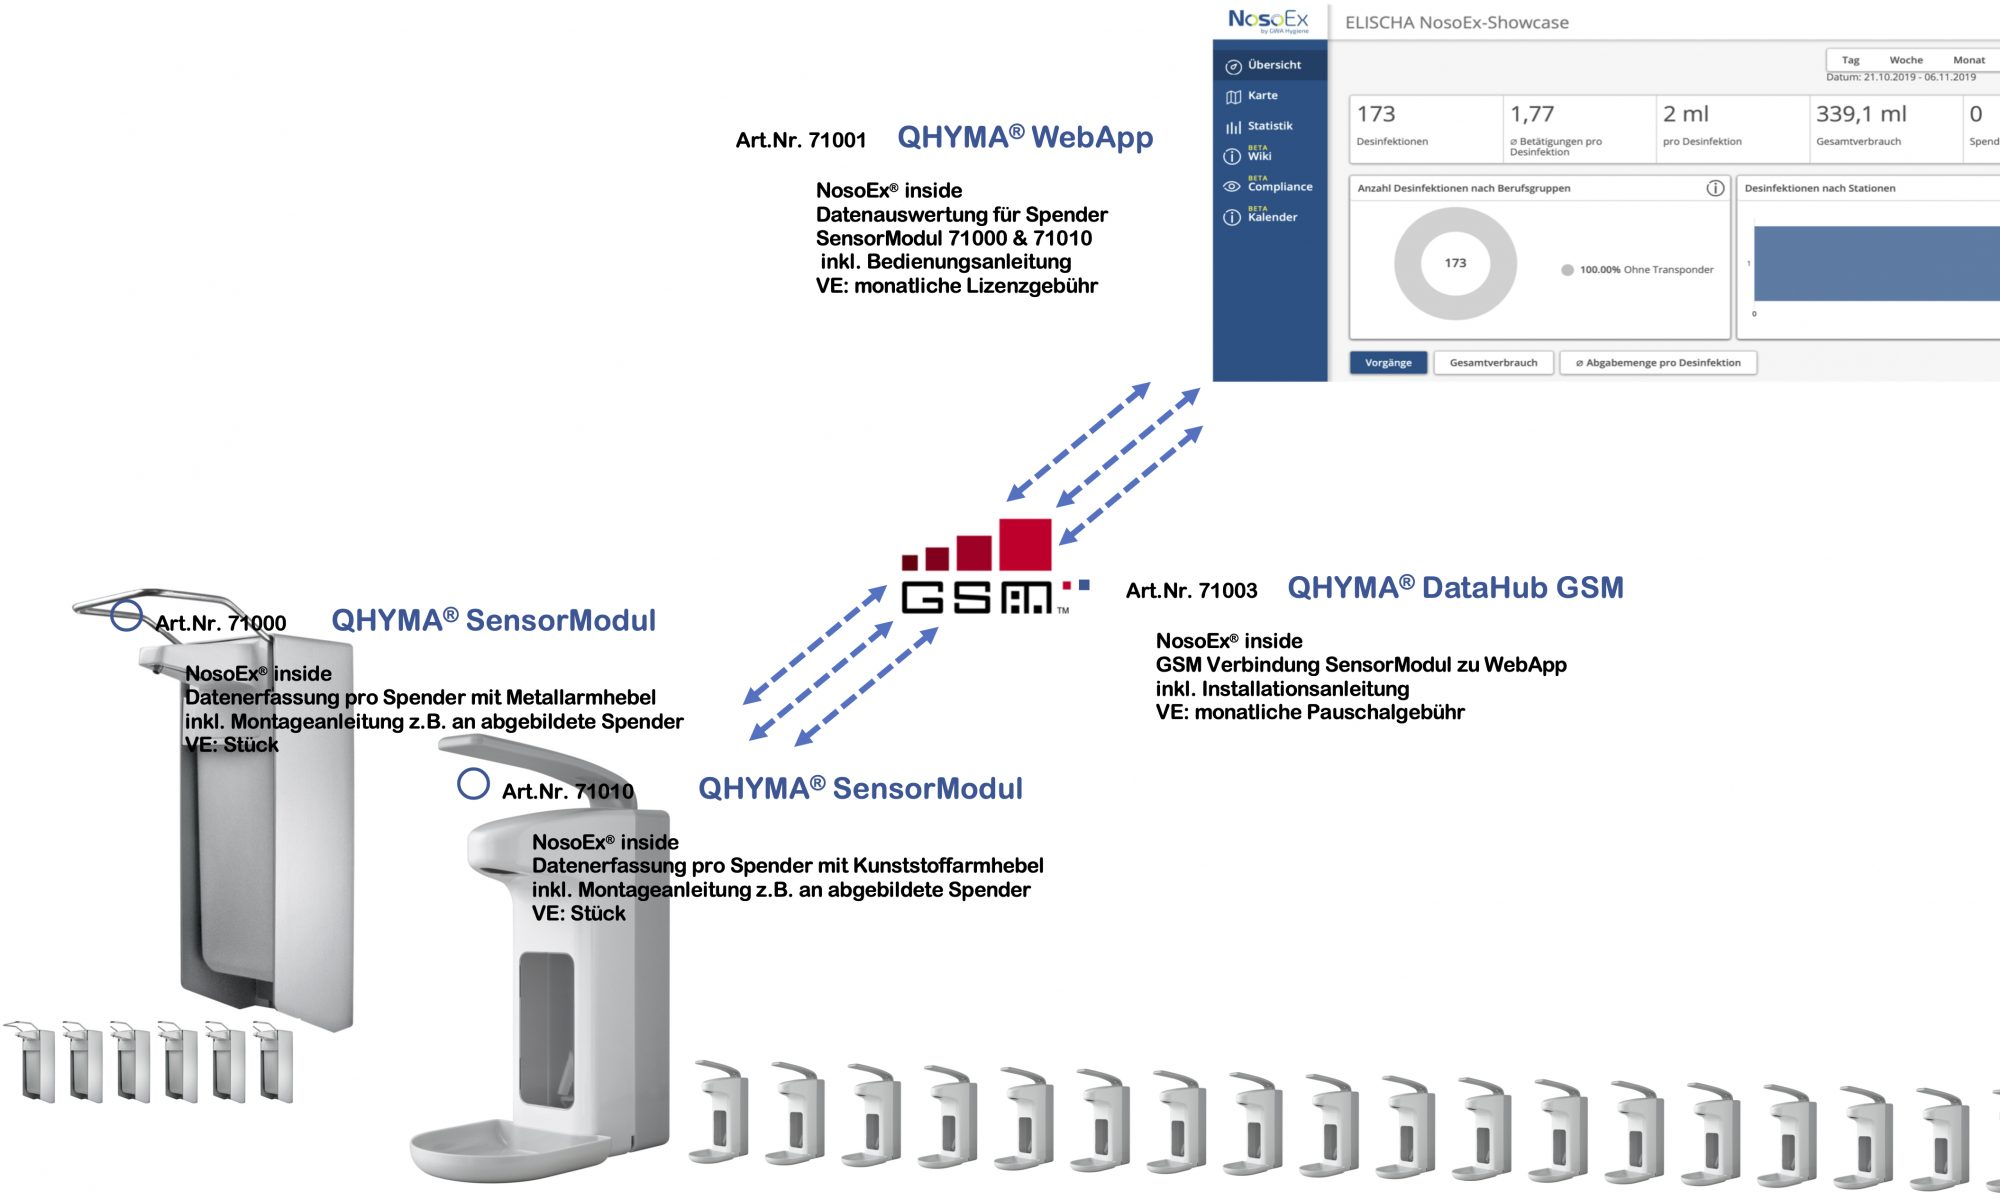 QHYMA® Qualitätsmanagement Hygiene Monitoring Applikation